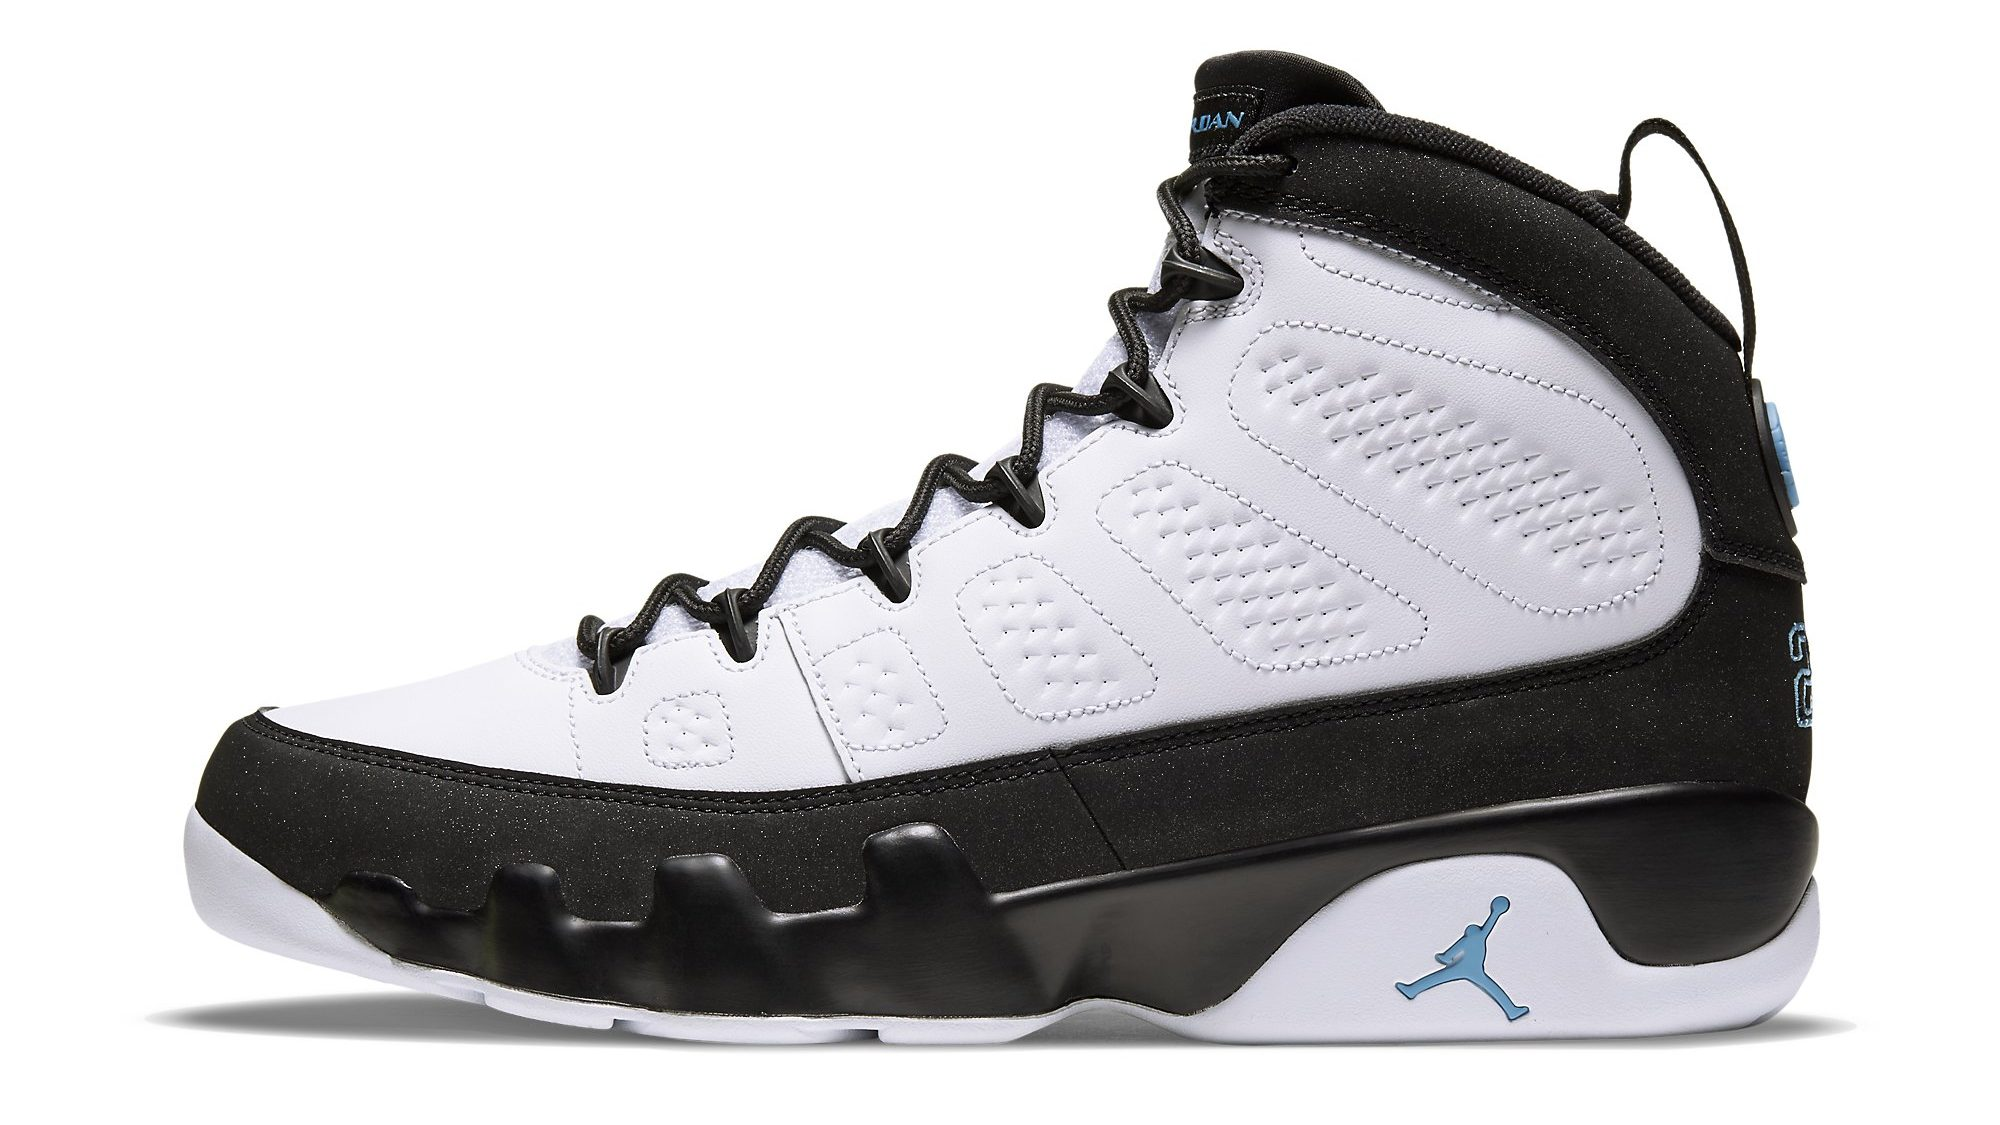 Air Jordan 9 'University Blue' Release